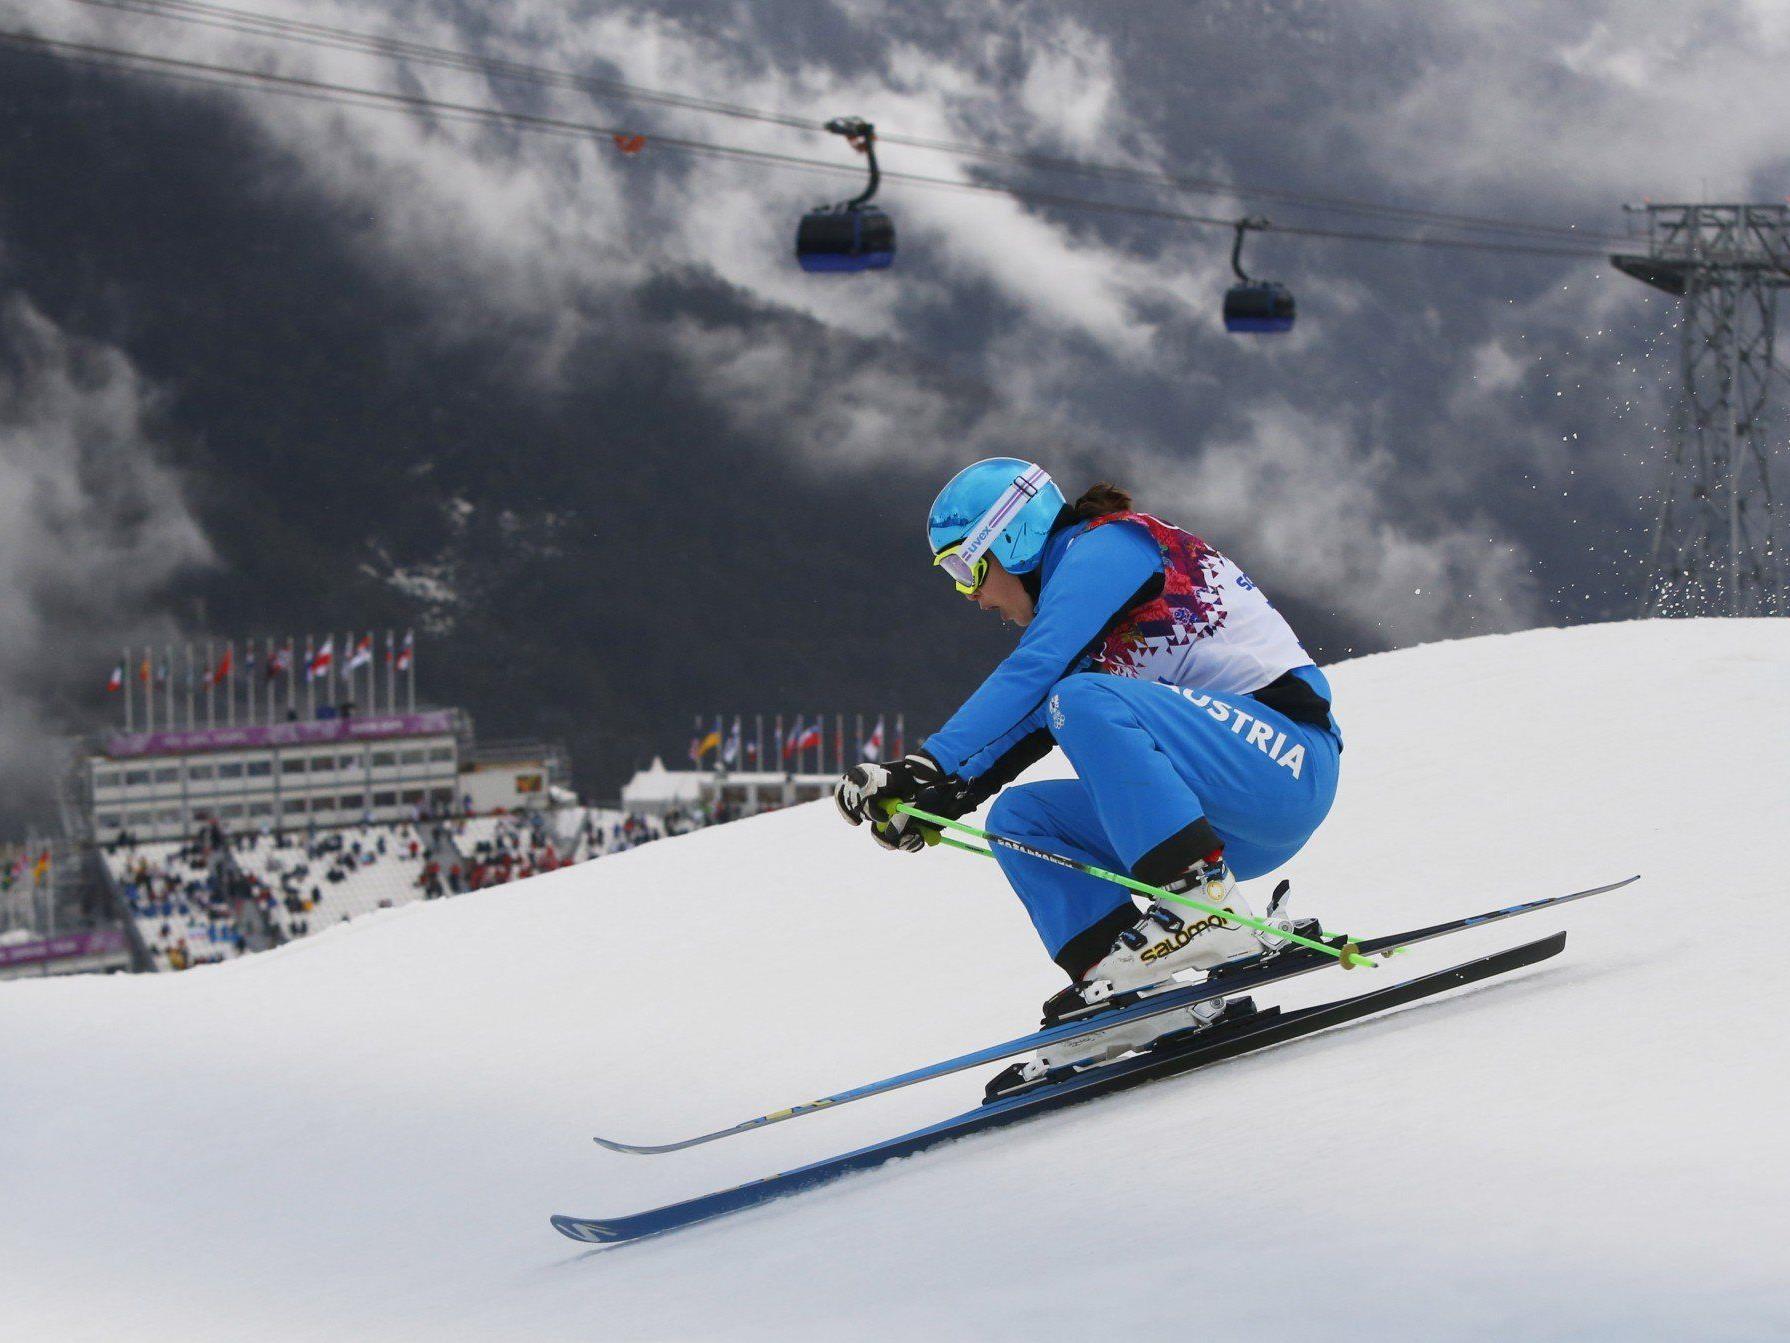 Katrin Ofner auf Platz 13, Limbacher 23., Staudinger 24.